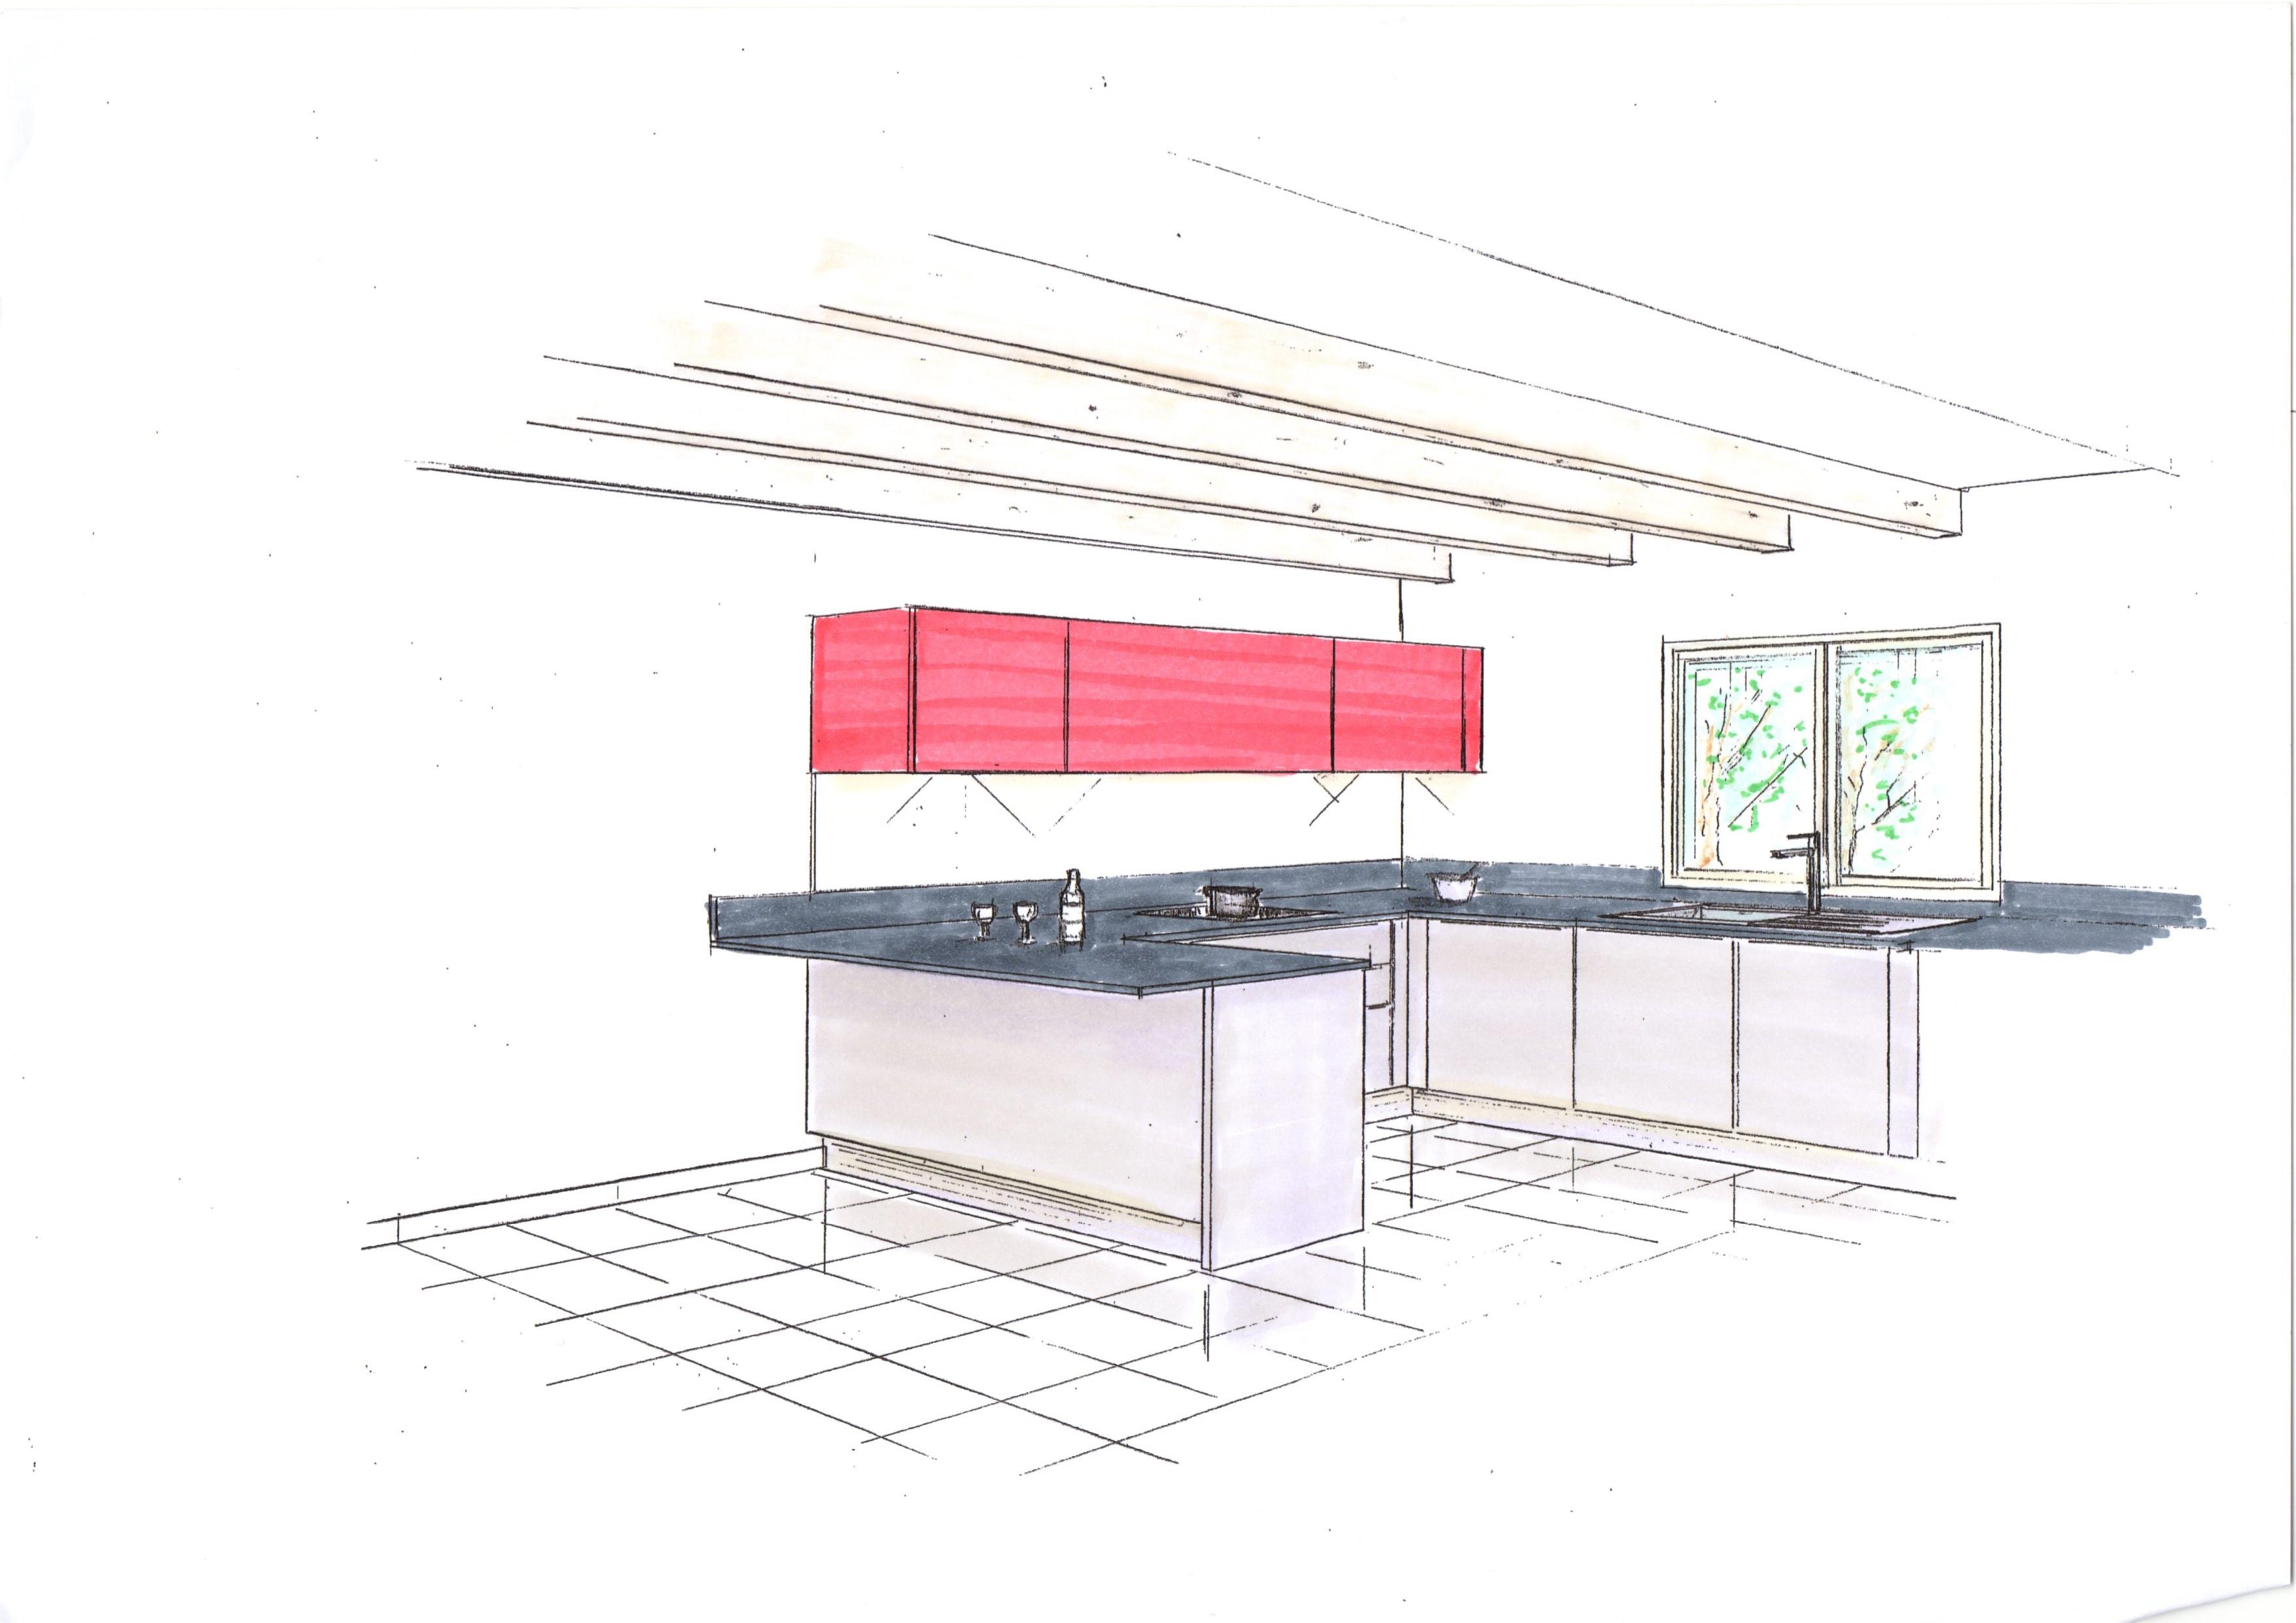 cuisinistes bordeaux interesting photo cuisine russie with cuisinistes bordeaux awesome photo. Black Bedroom Furniture Sets. Home Design Ideas